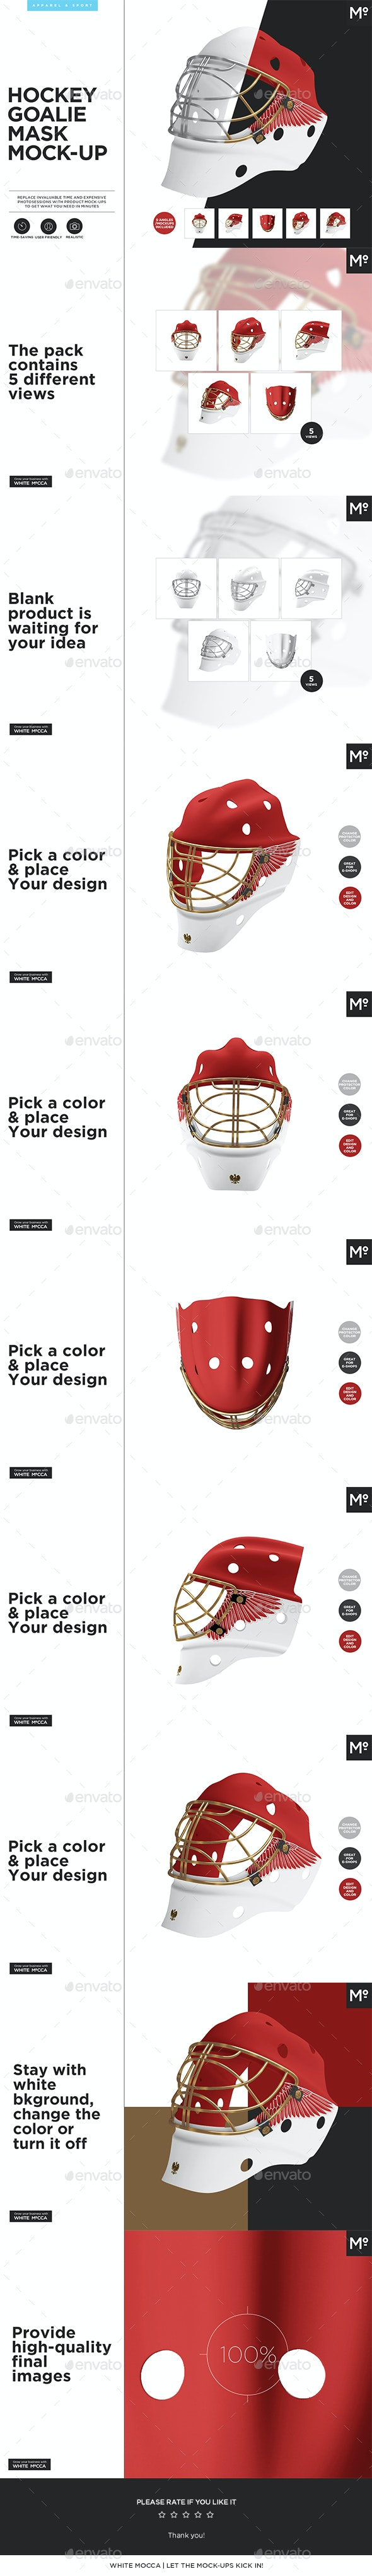 Hockey Goalie Mask Mock-up - Miscellaneous Apparel